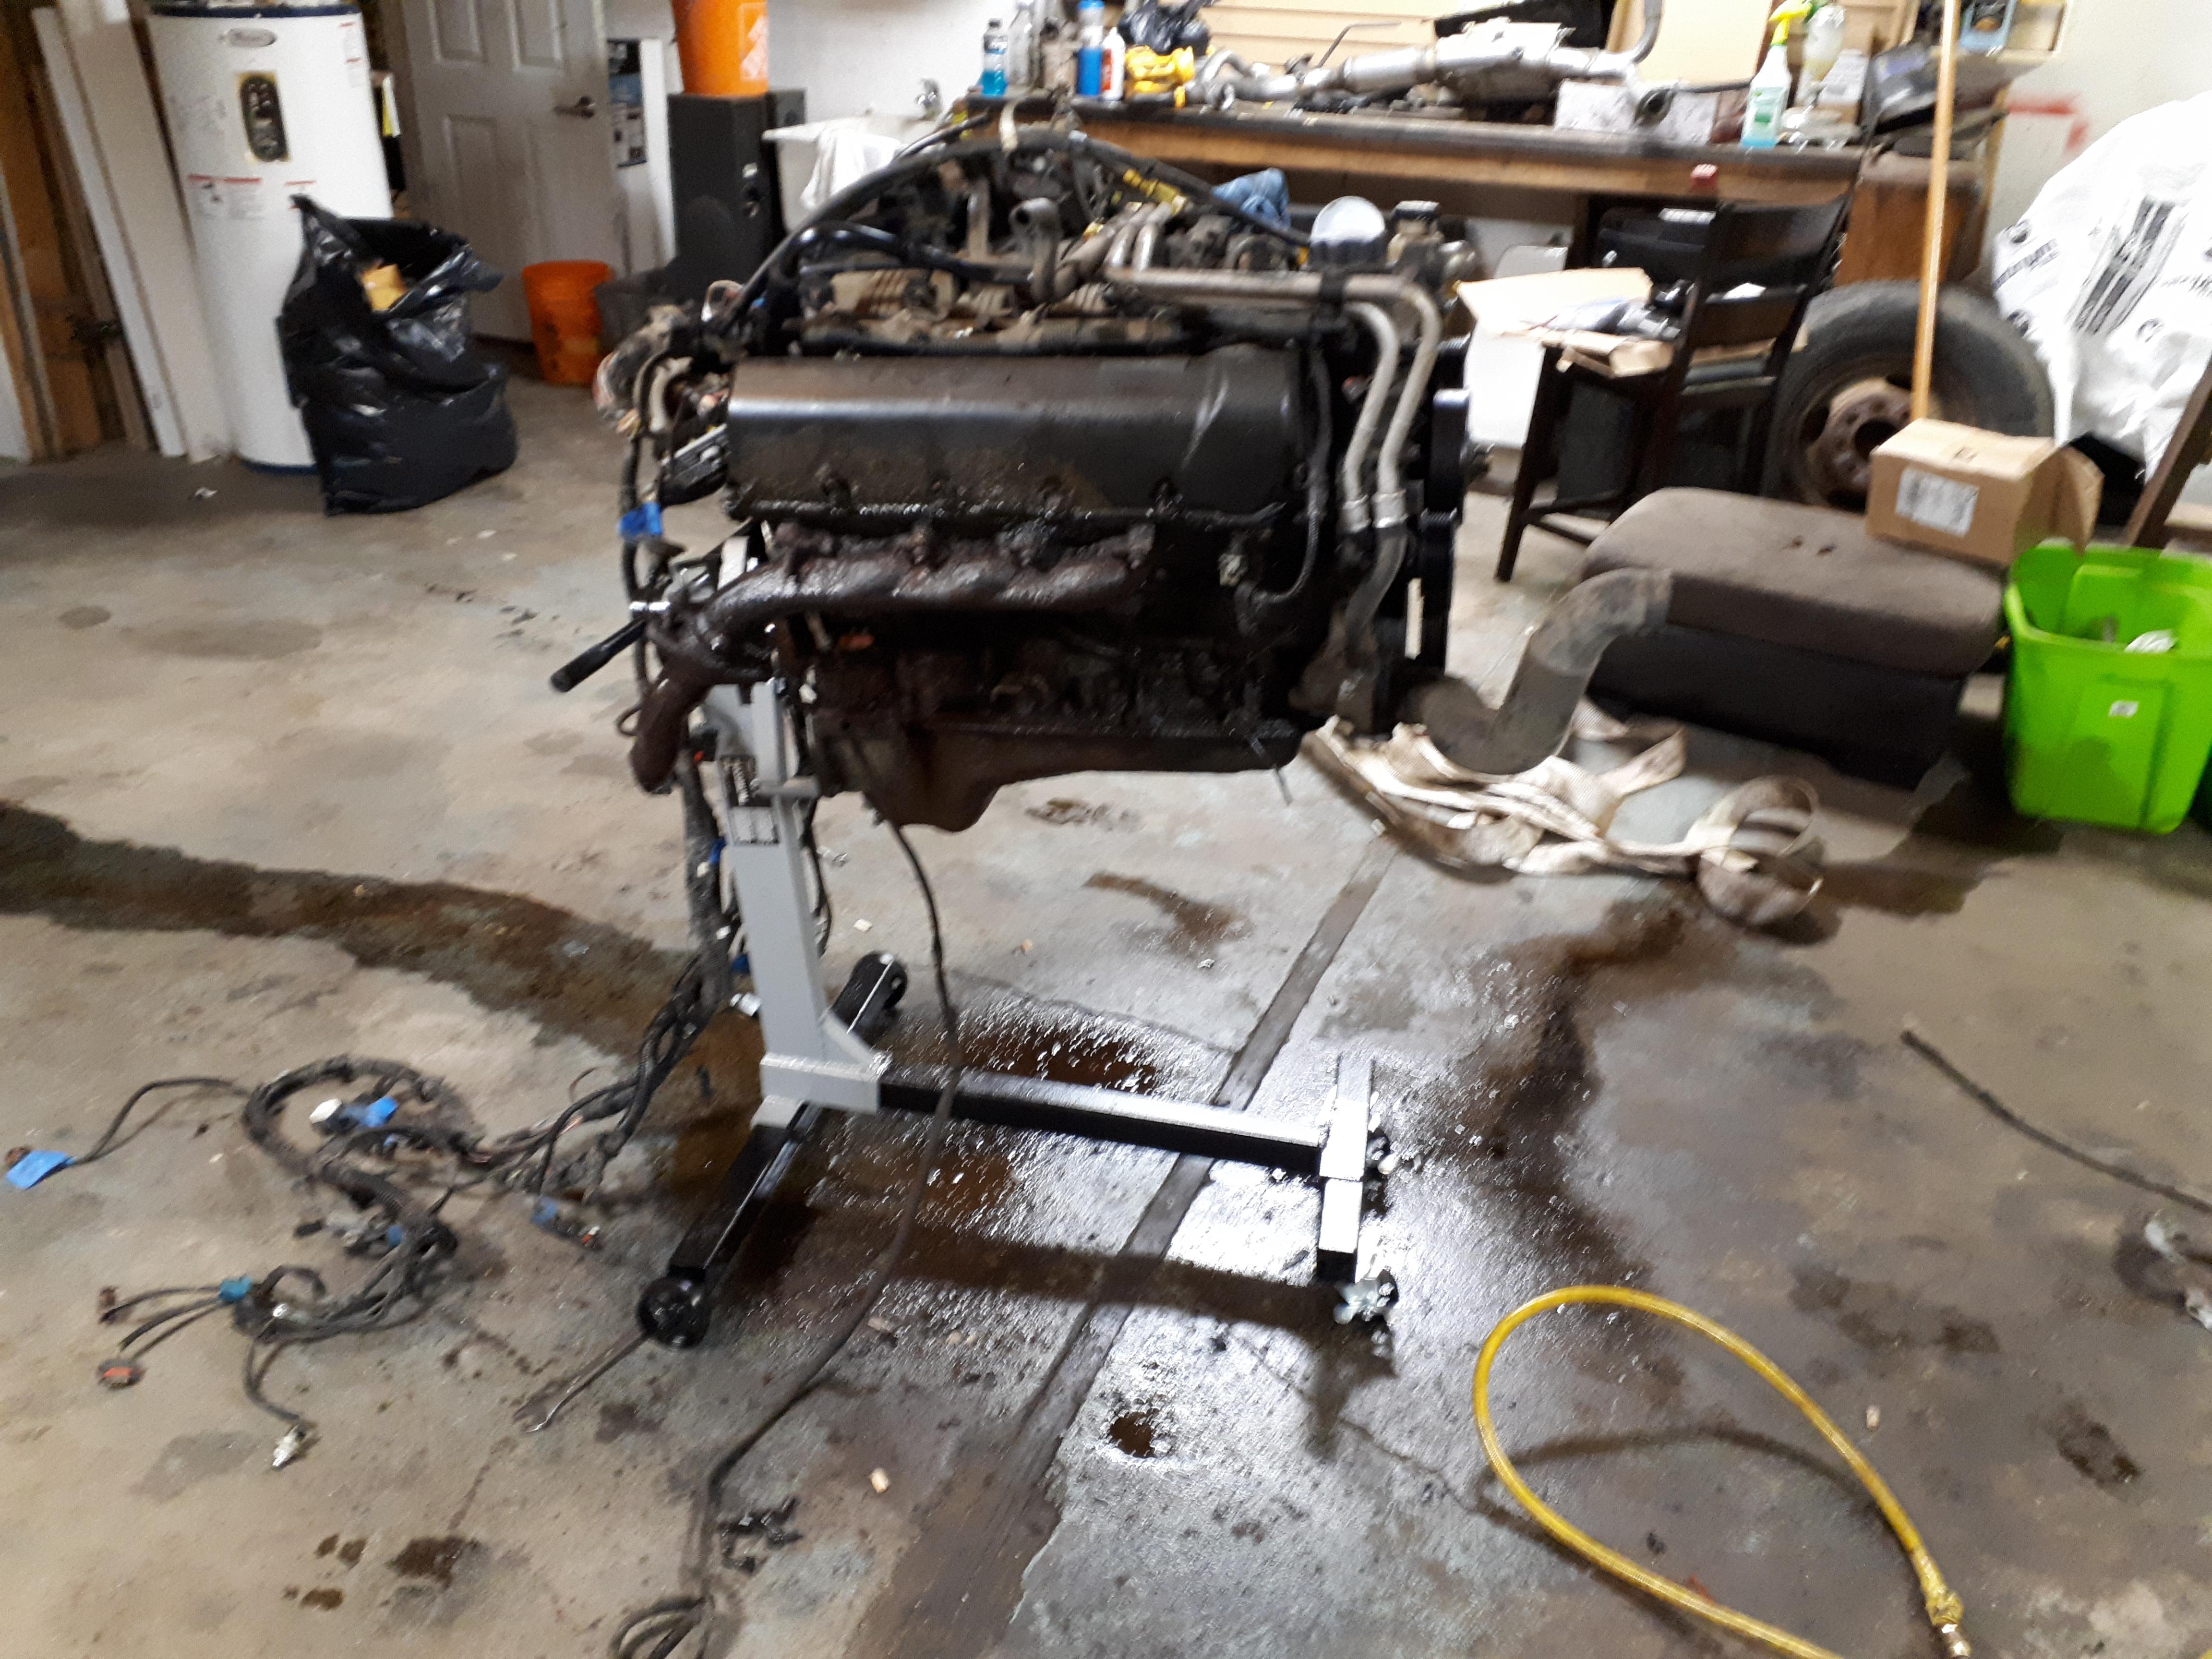 Converting durango 4.7 to manual  transmission-20181004_210247_1539531360130.jpg ...